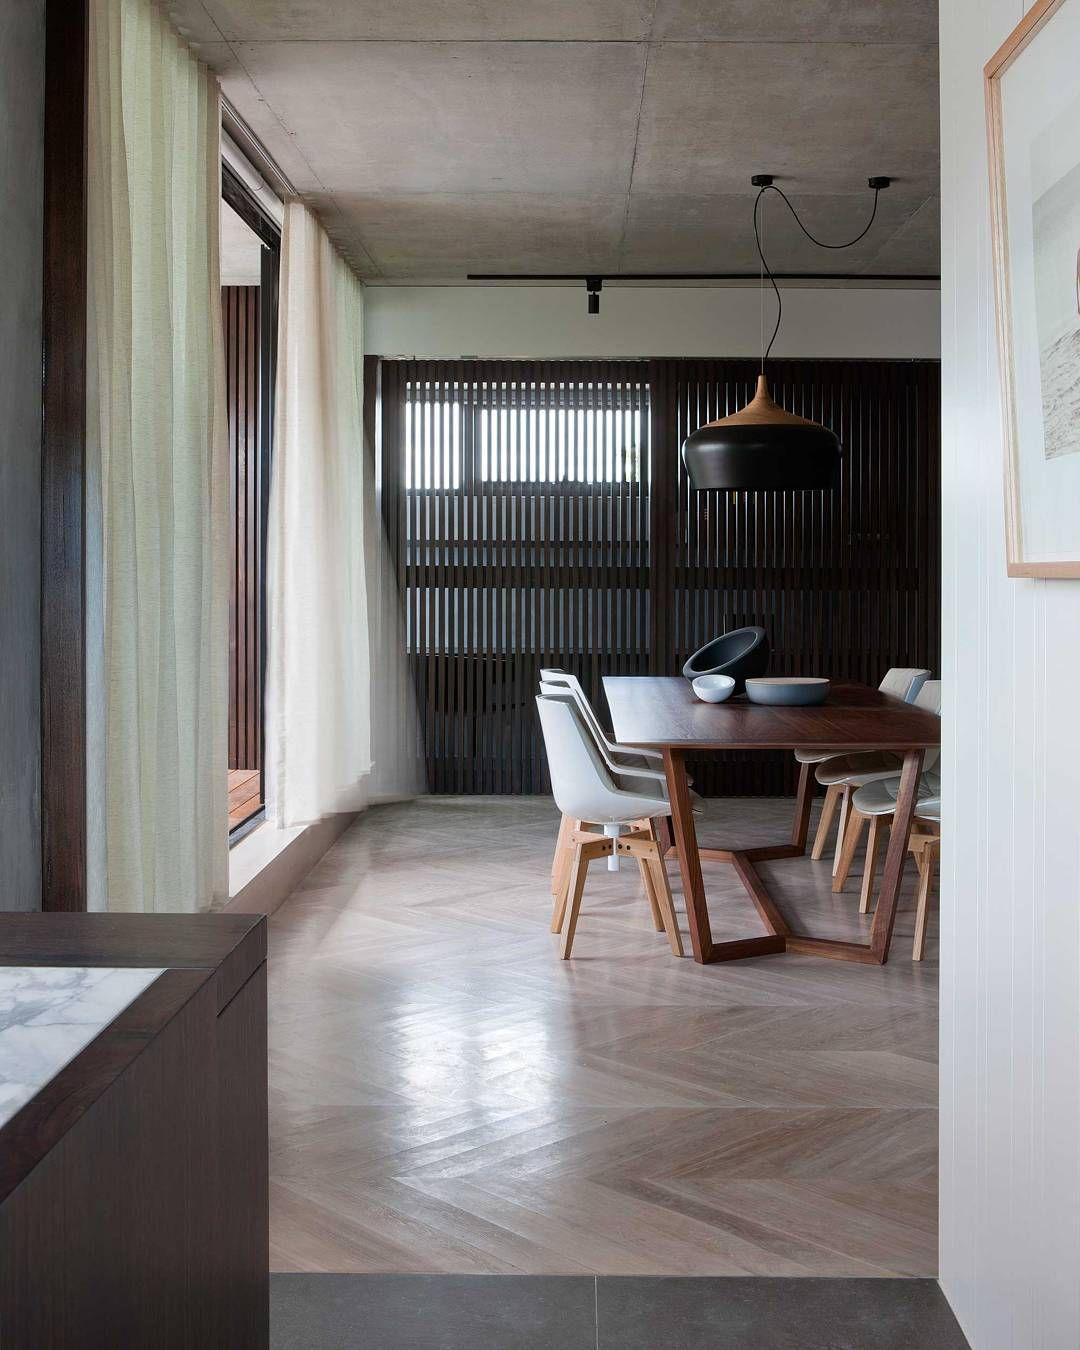 Interior Design Vs Architecture Reddit: Atticus By Lowe Furniture Via @hub_furniture. #design